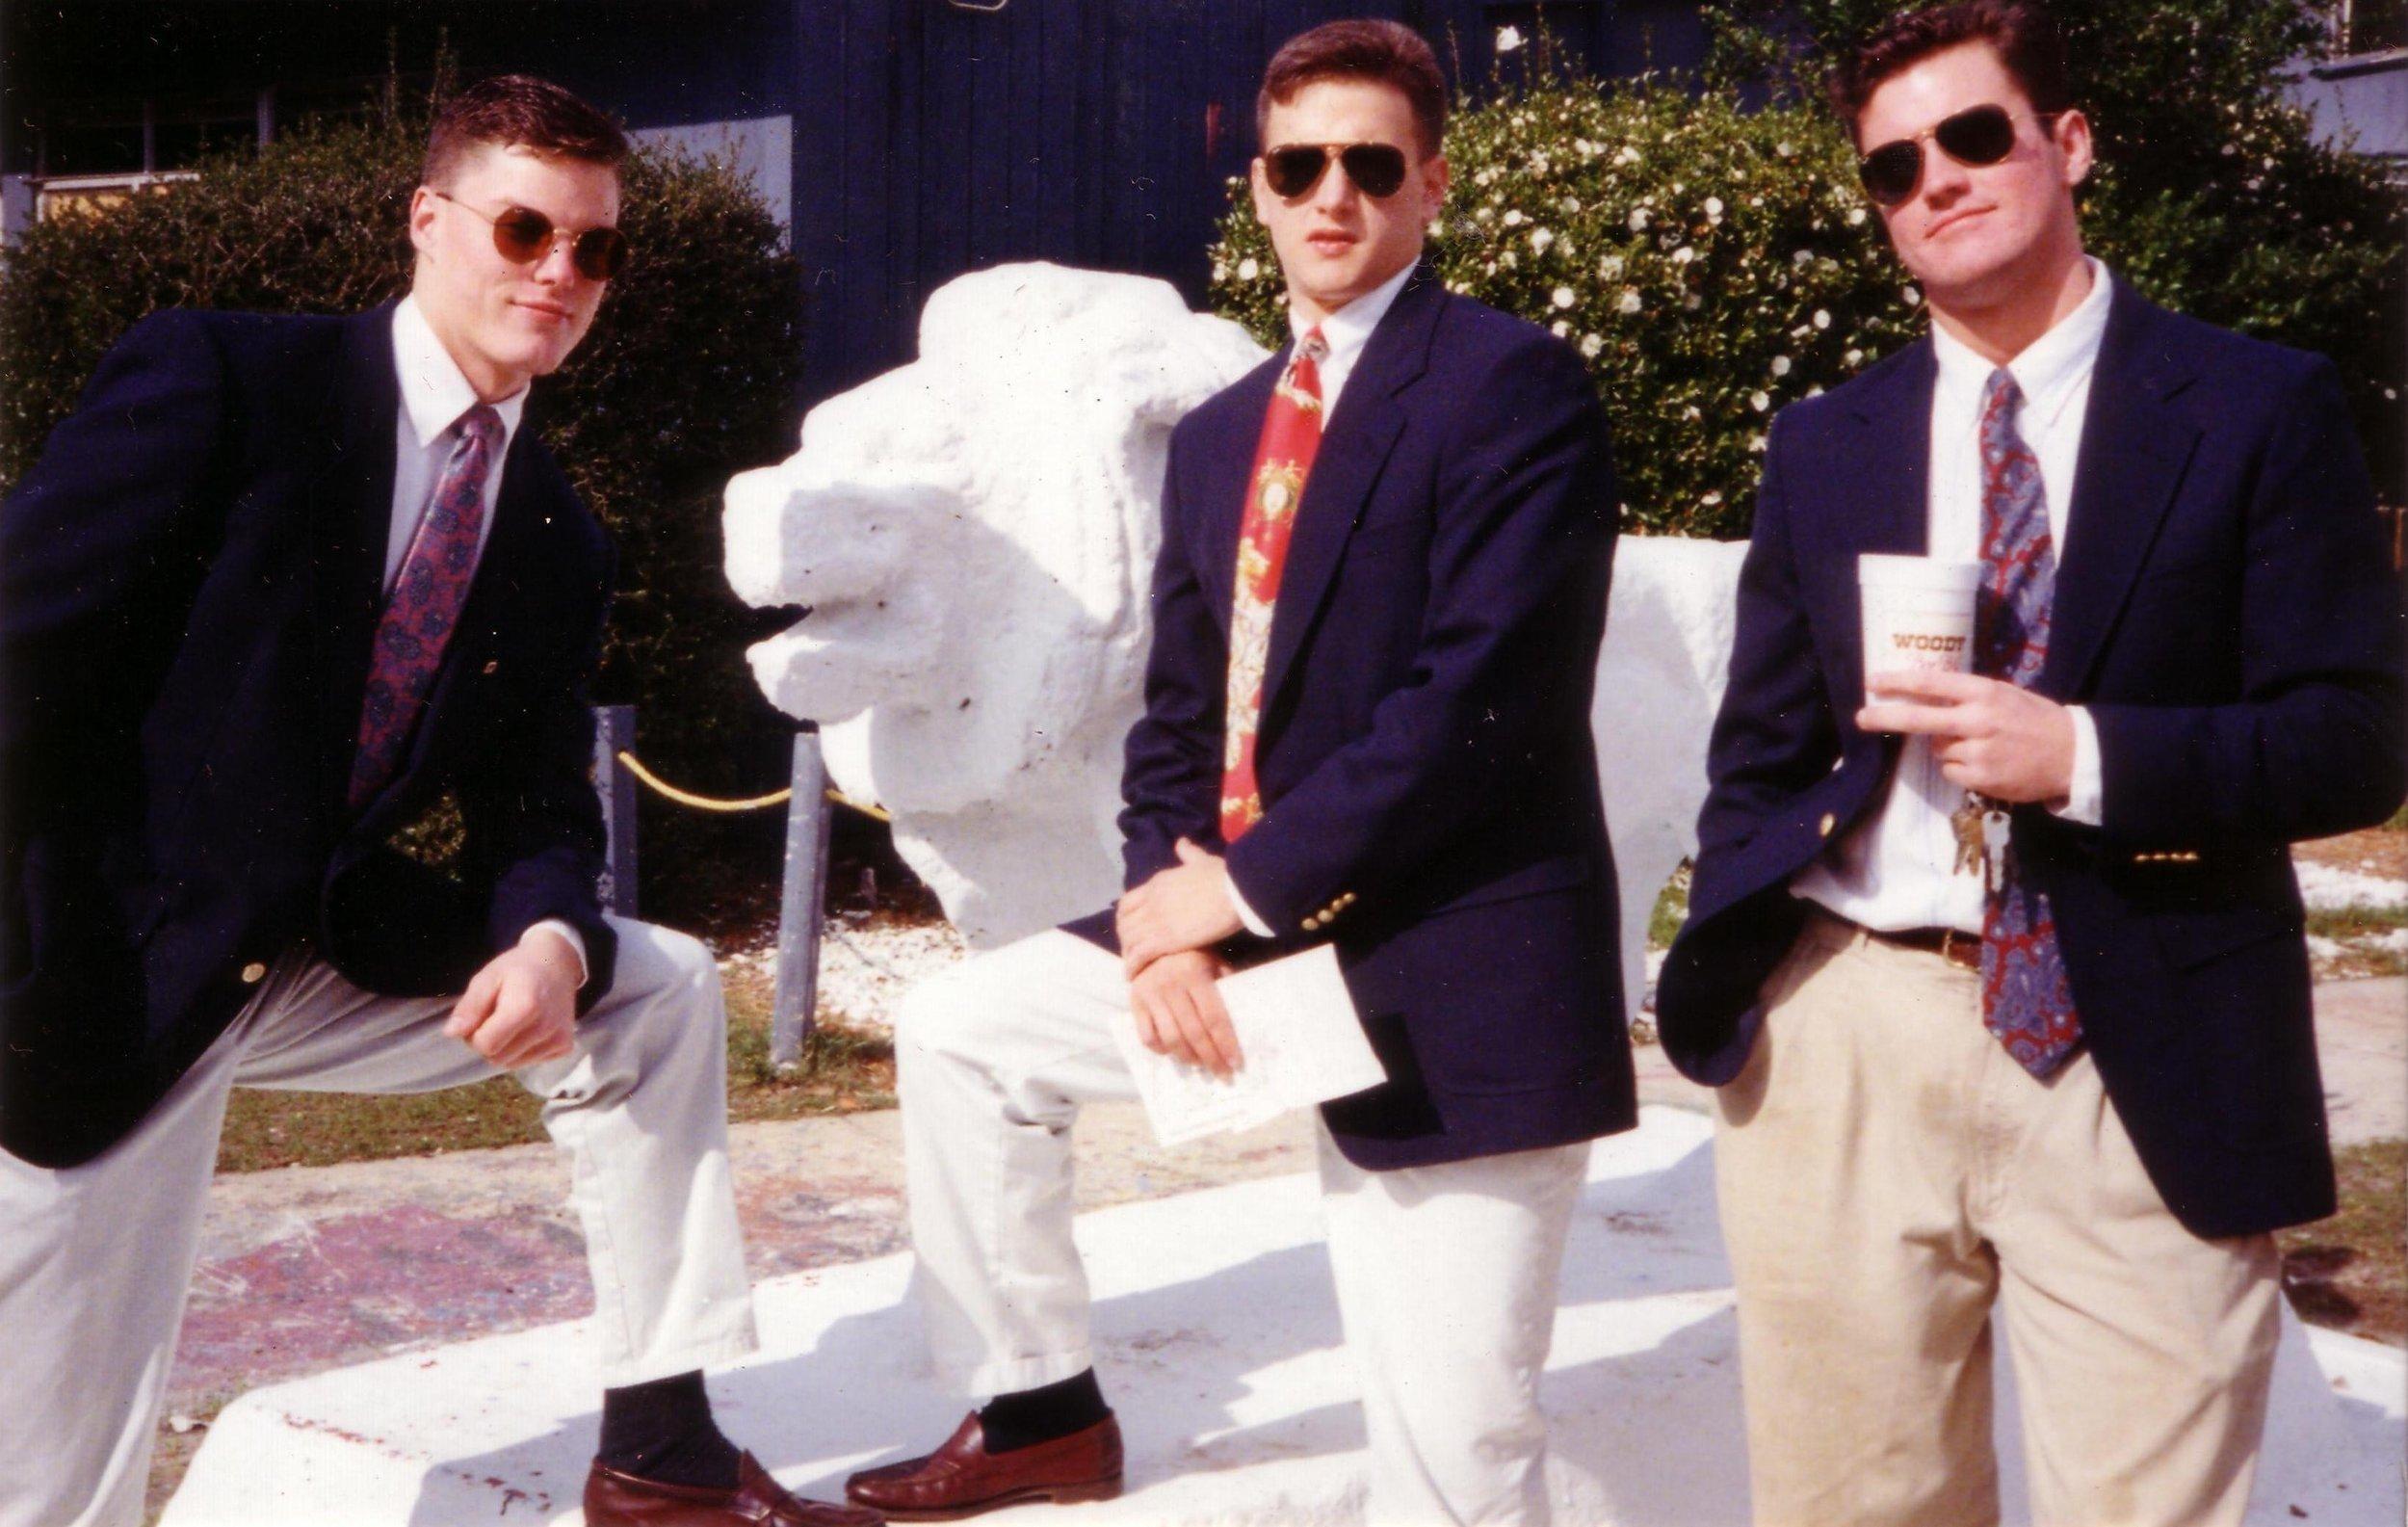 1994 GrayDrummond, MikeGrogan, TomHarrison.jpg